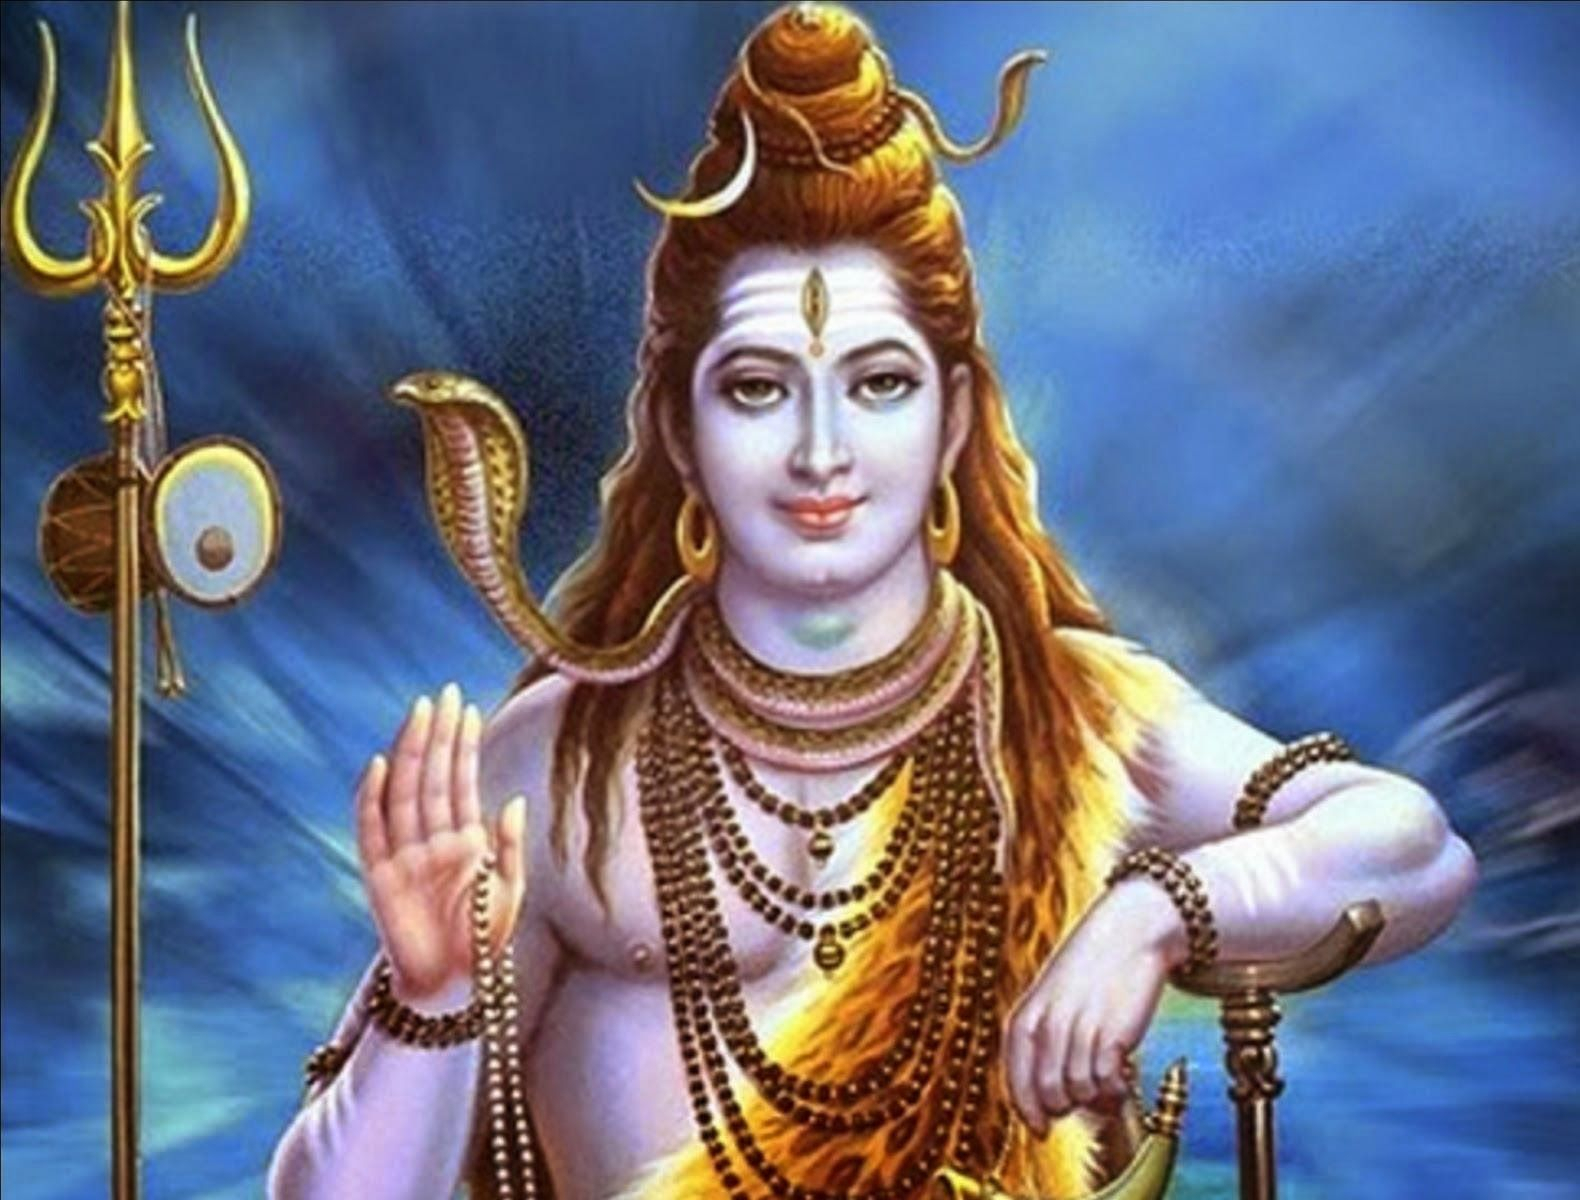 god sivan க்கான பட முடிவு